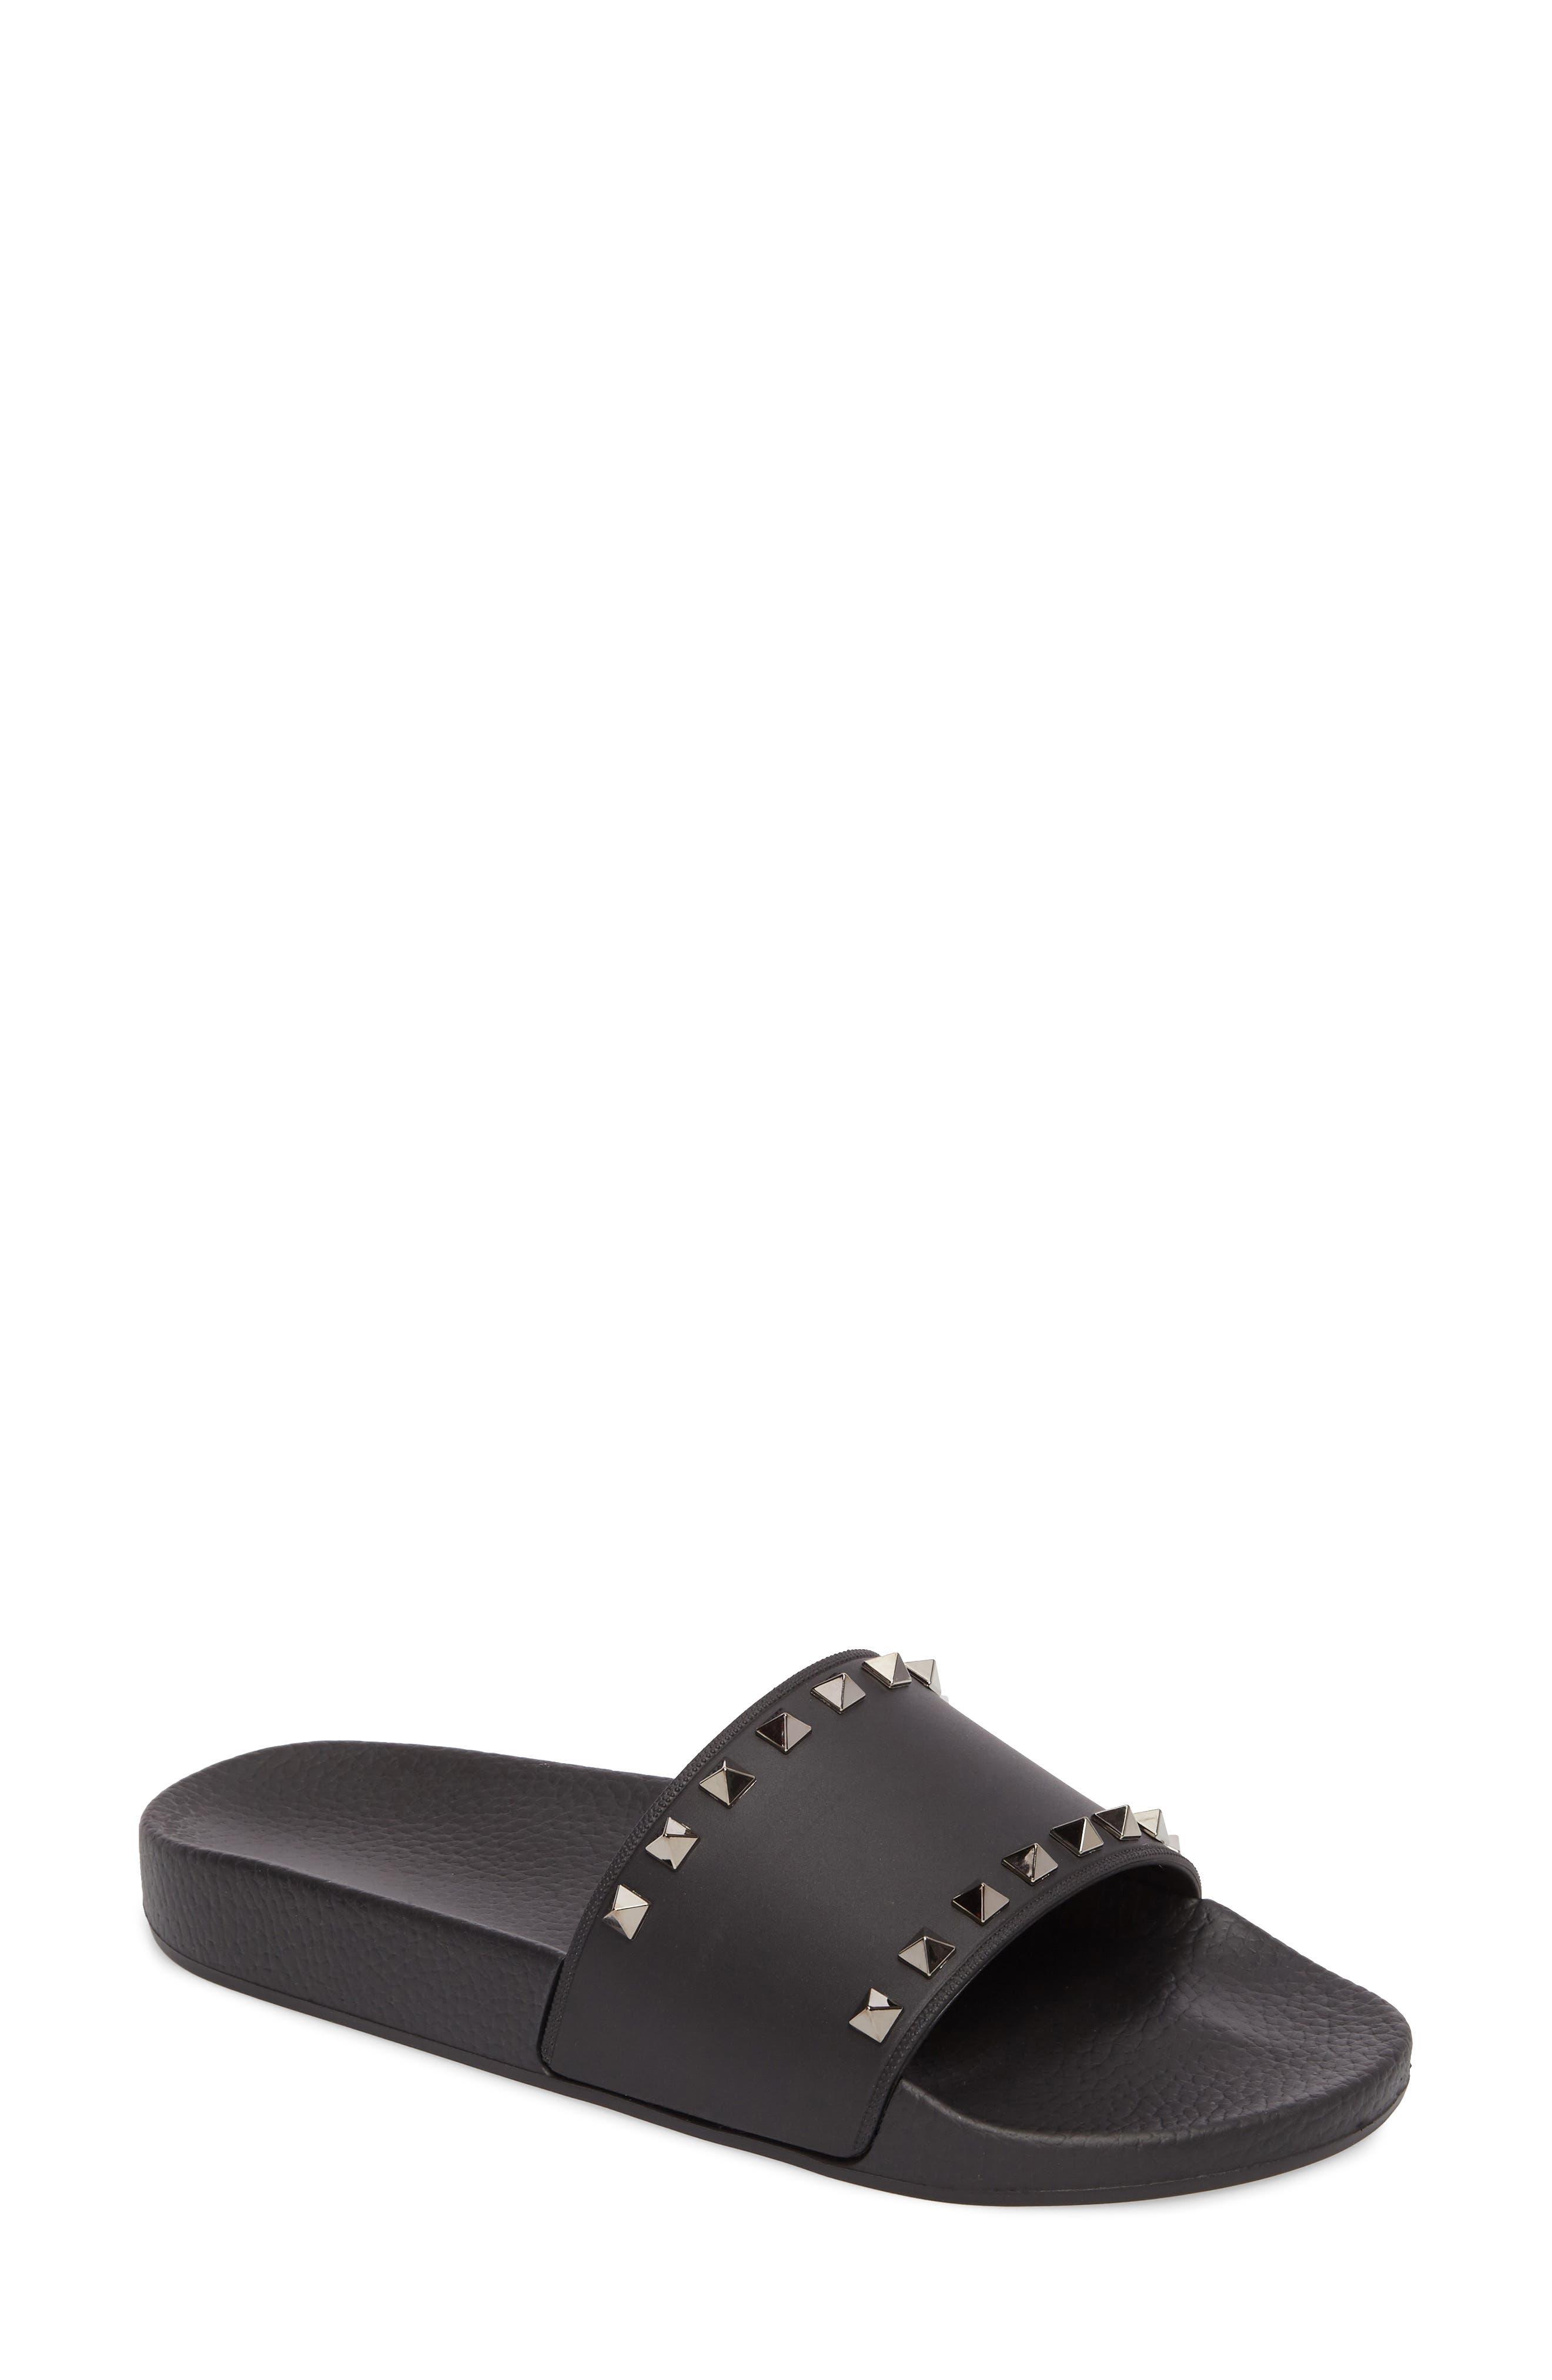 VALENTINO GARAVANI Rockstud Slide Sandal (Women)